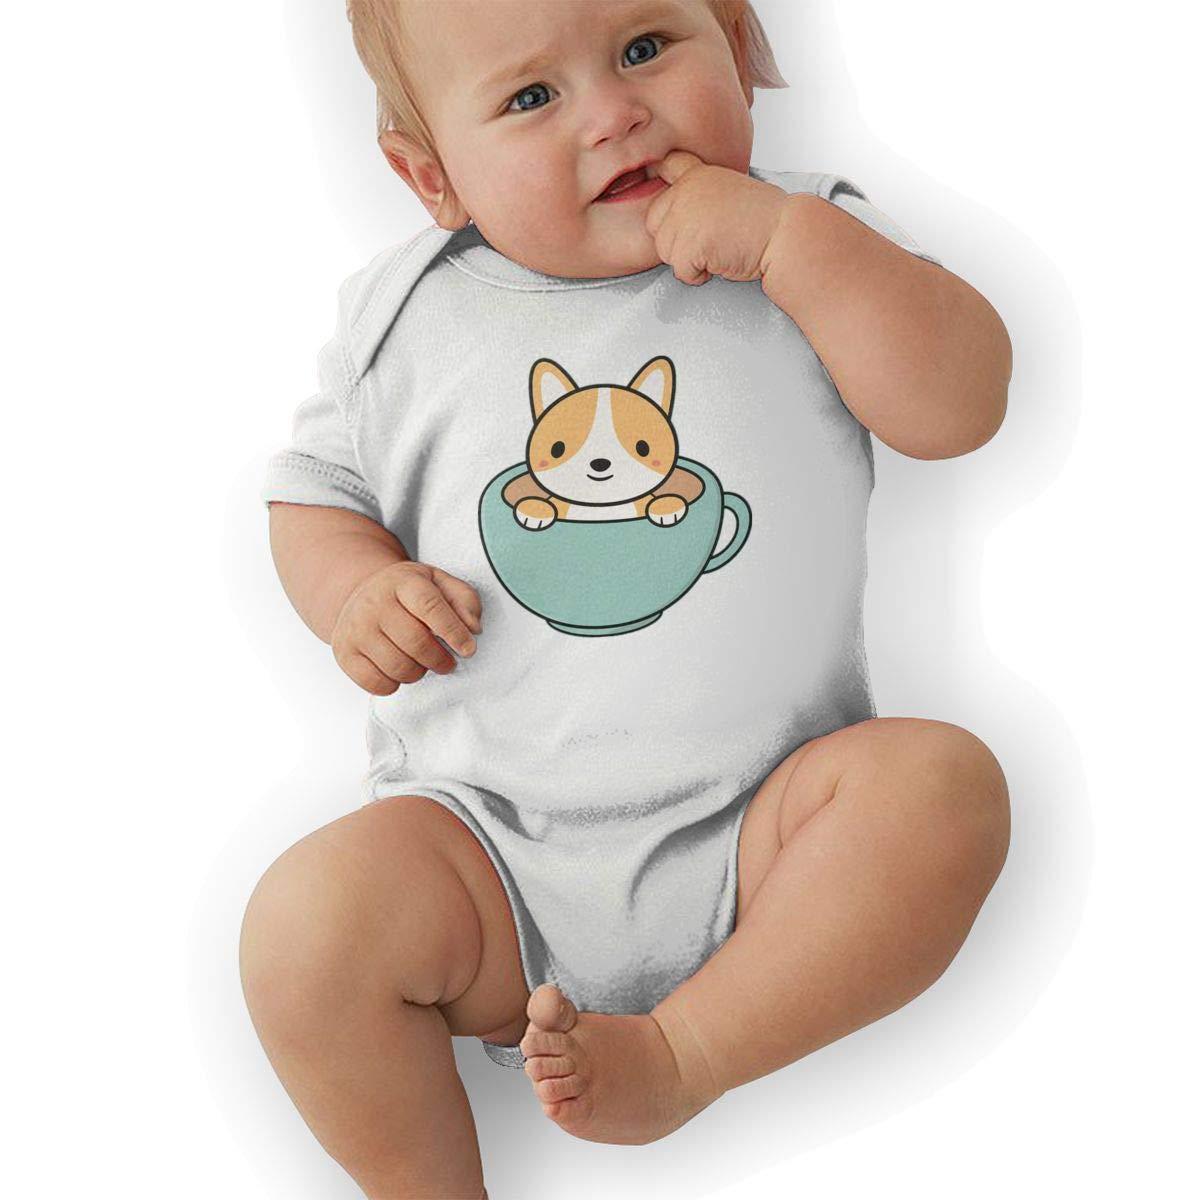 Corgi Dog is Kawaii Cute Newborn Baby Short Sleeve Romper Infant Summer Clothing